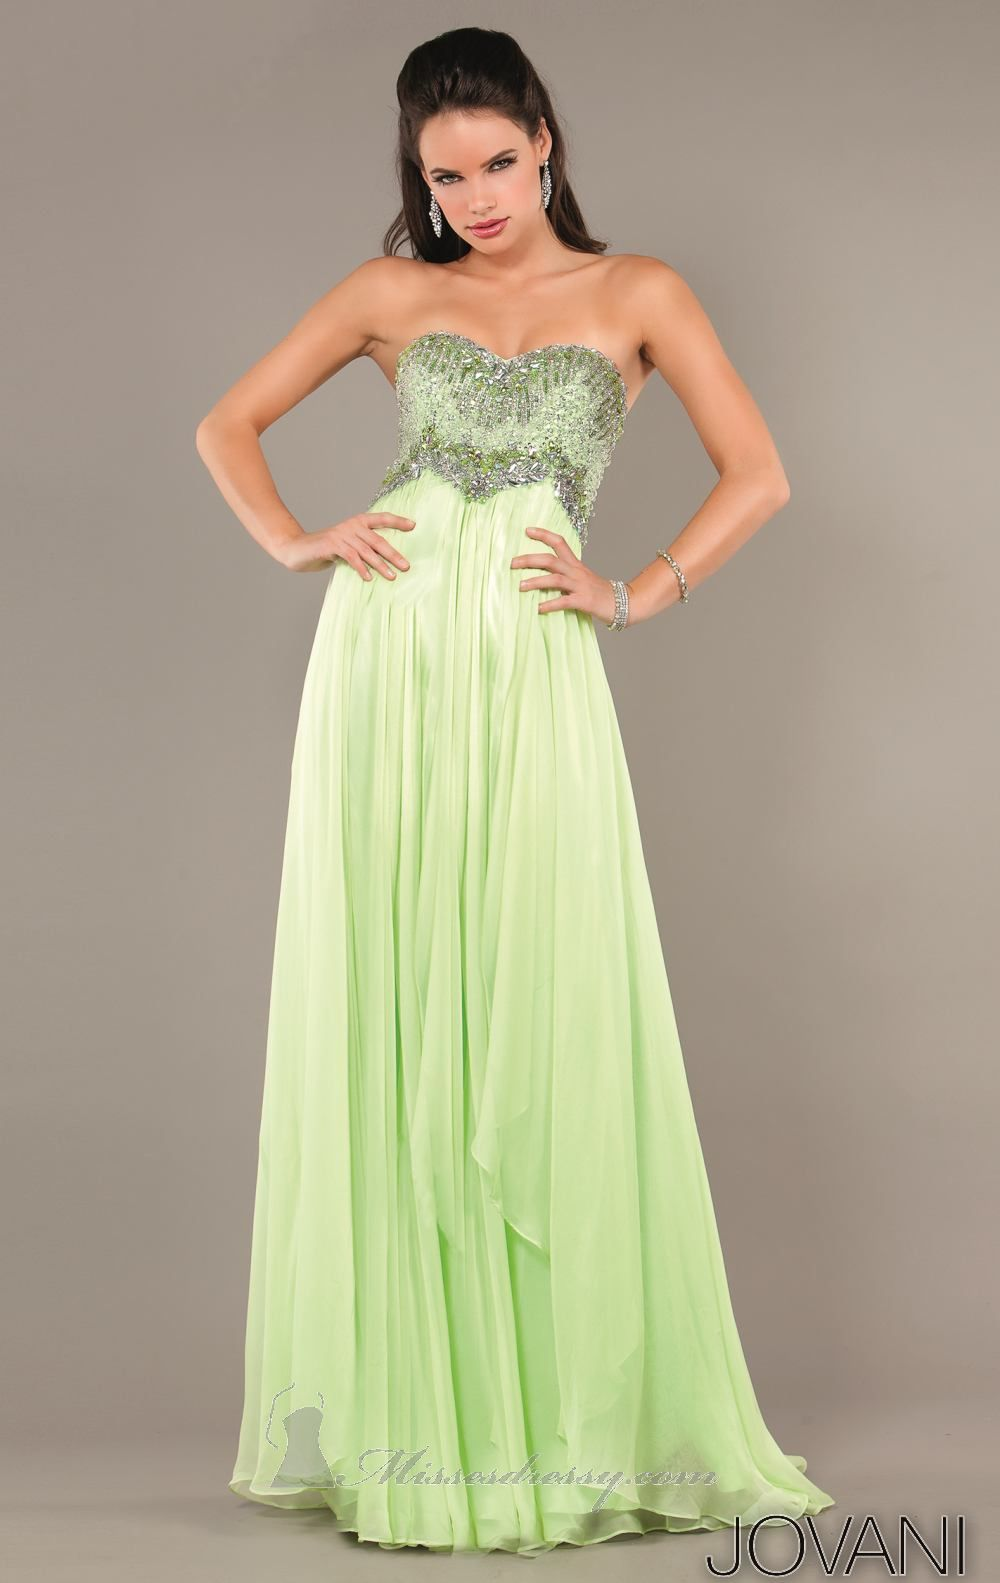 Jovani dress missesdressy s pinterest exclusive